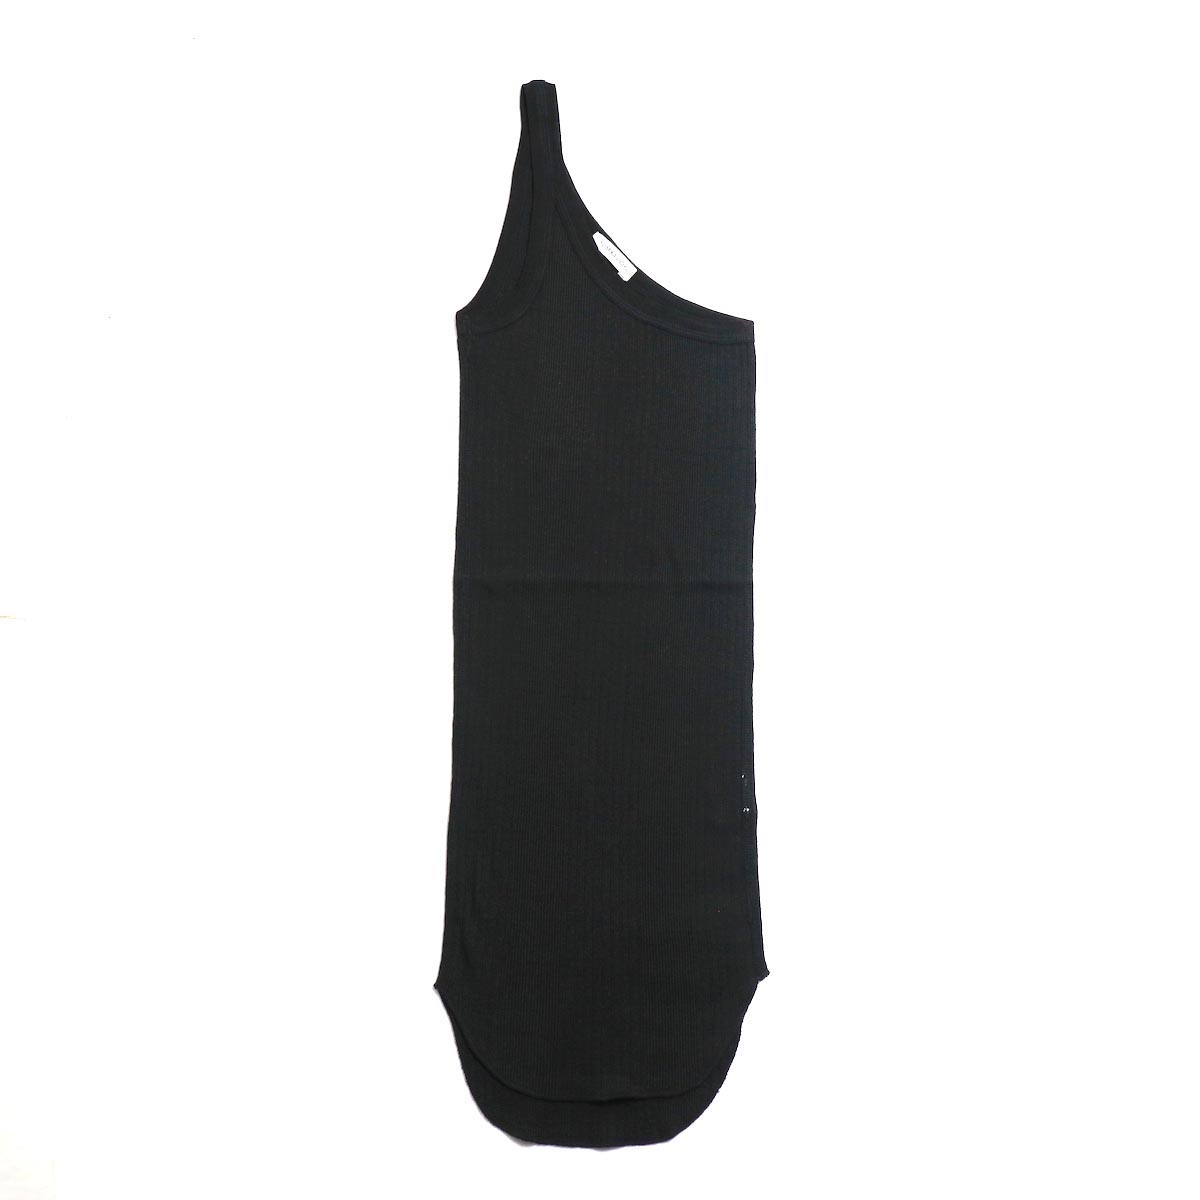 FUMIKA UCHIDA / Cotton Needle Drawing One Shoulder Tank Top -Black